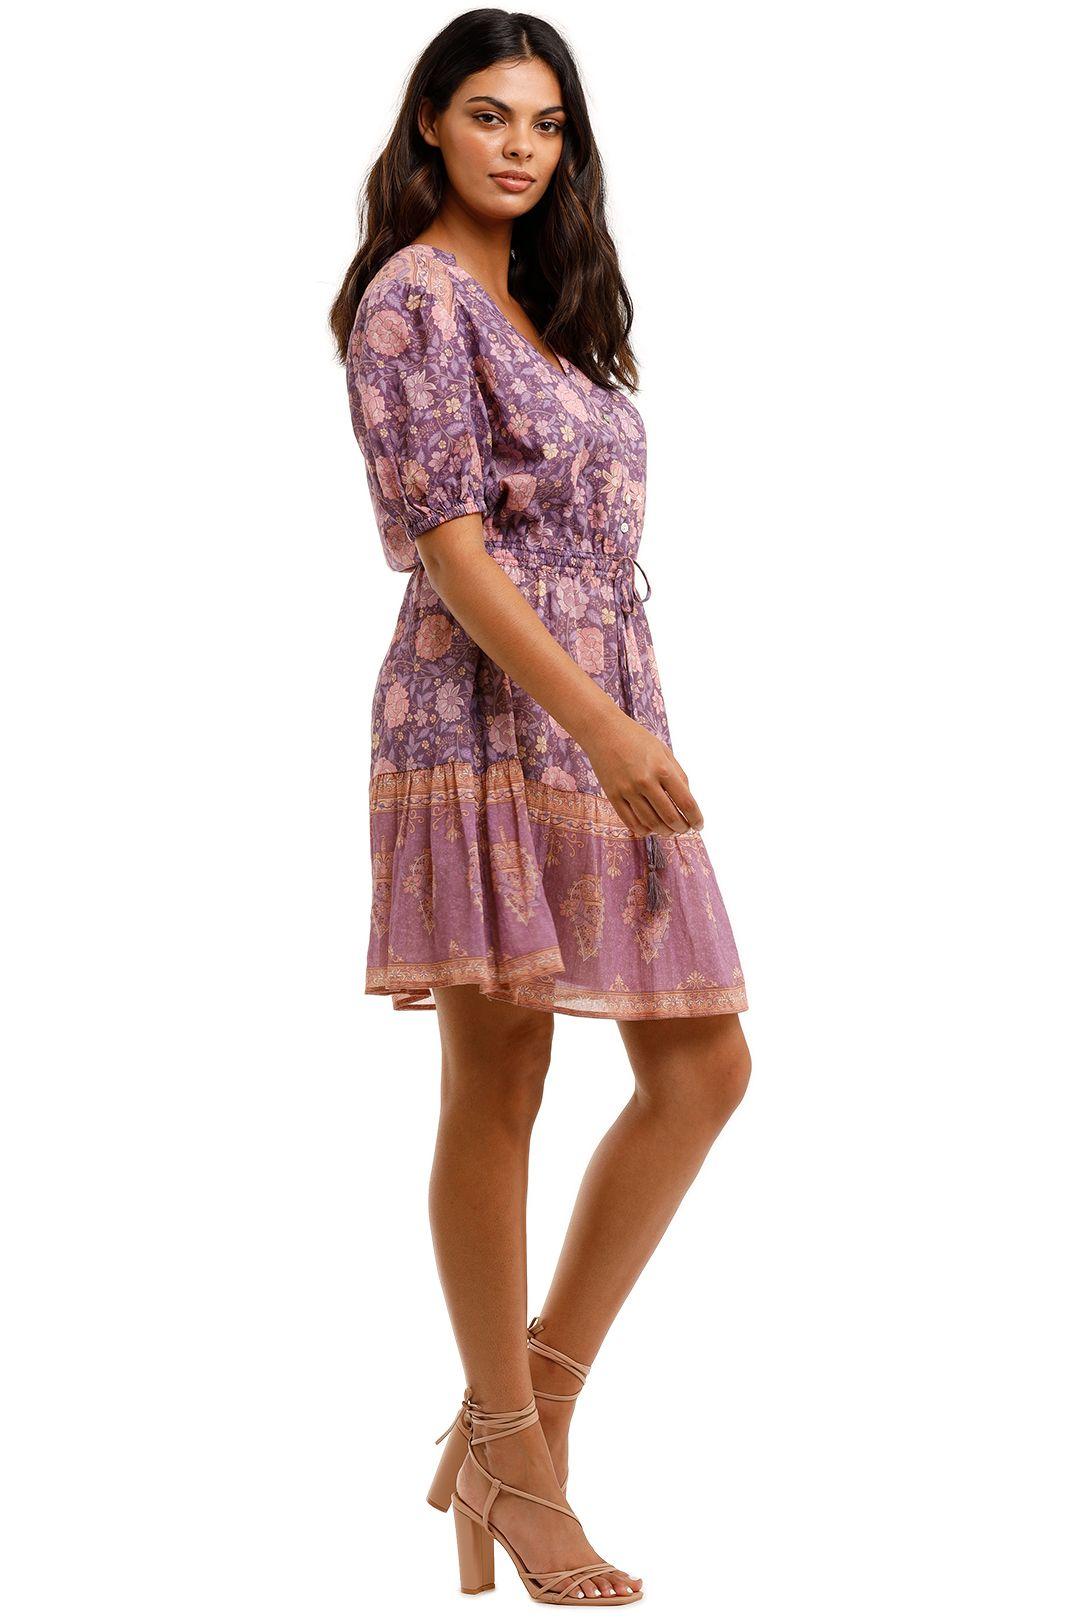 Spell Love Story Playdress Royal Lilac